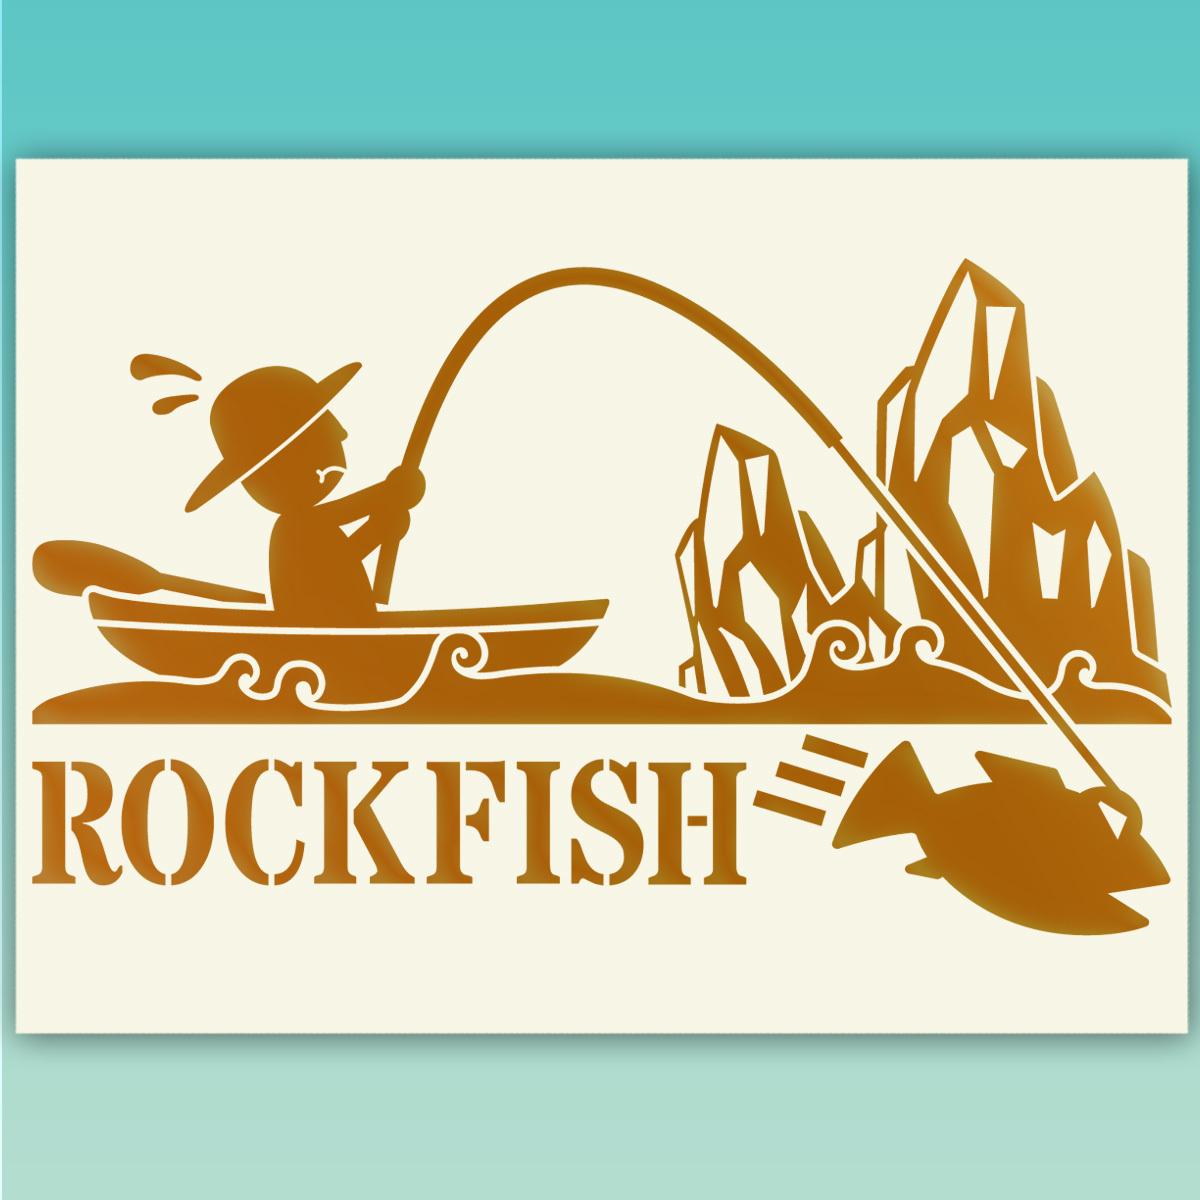 ●ROCKFISH ロックフィッシュ 釣り フィッシングステッカー  517 金色または銀色_画像1